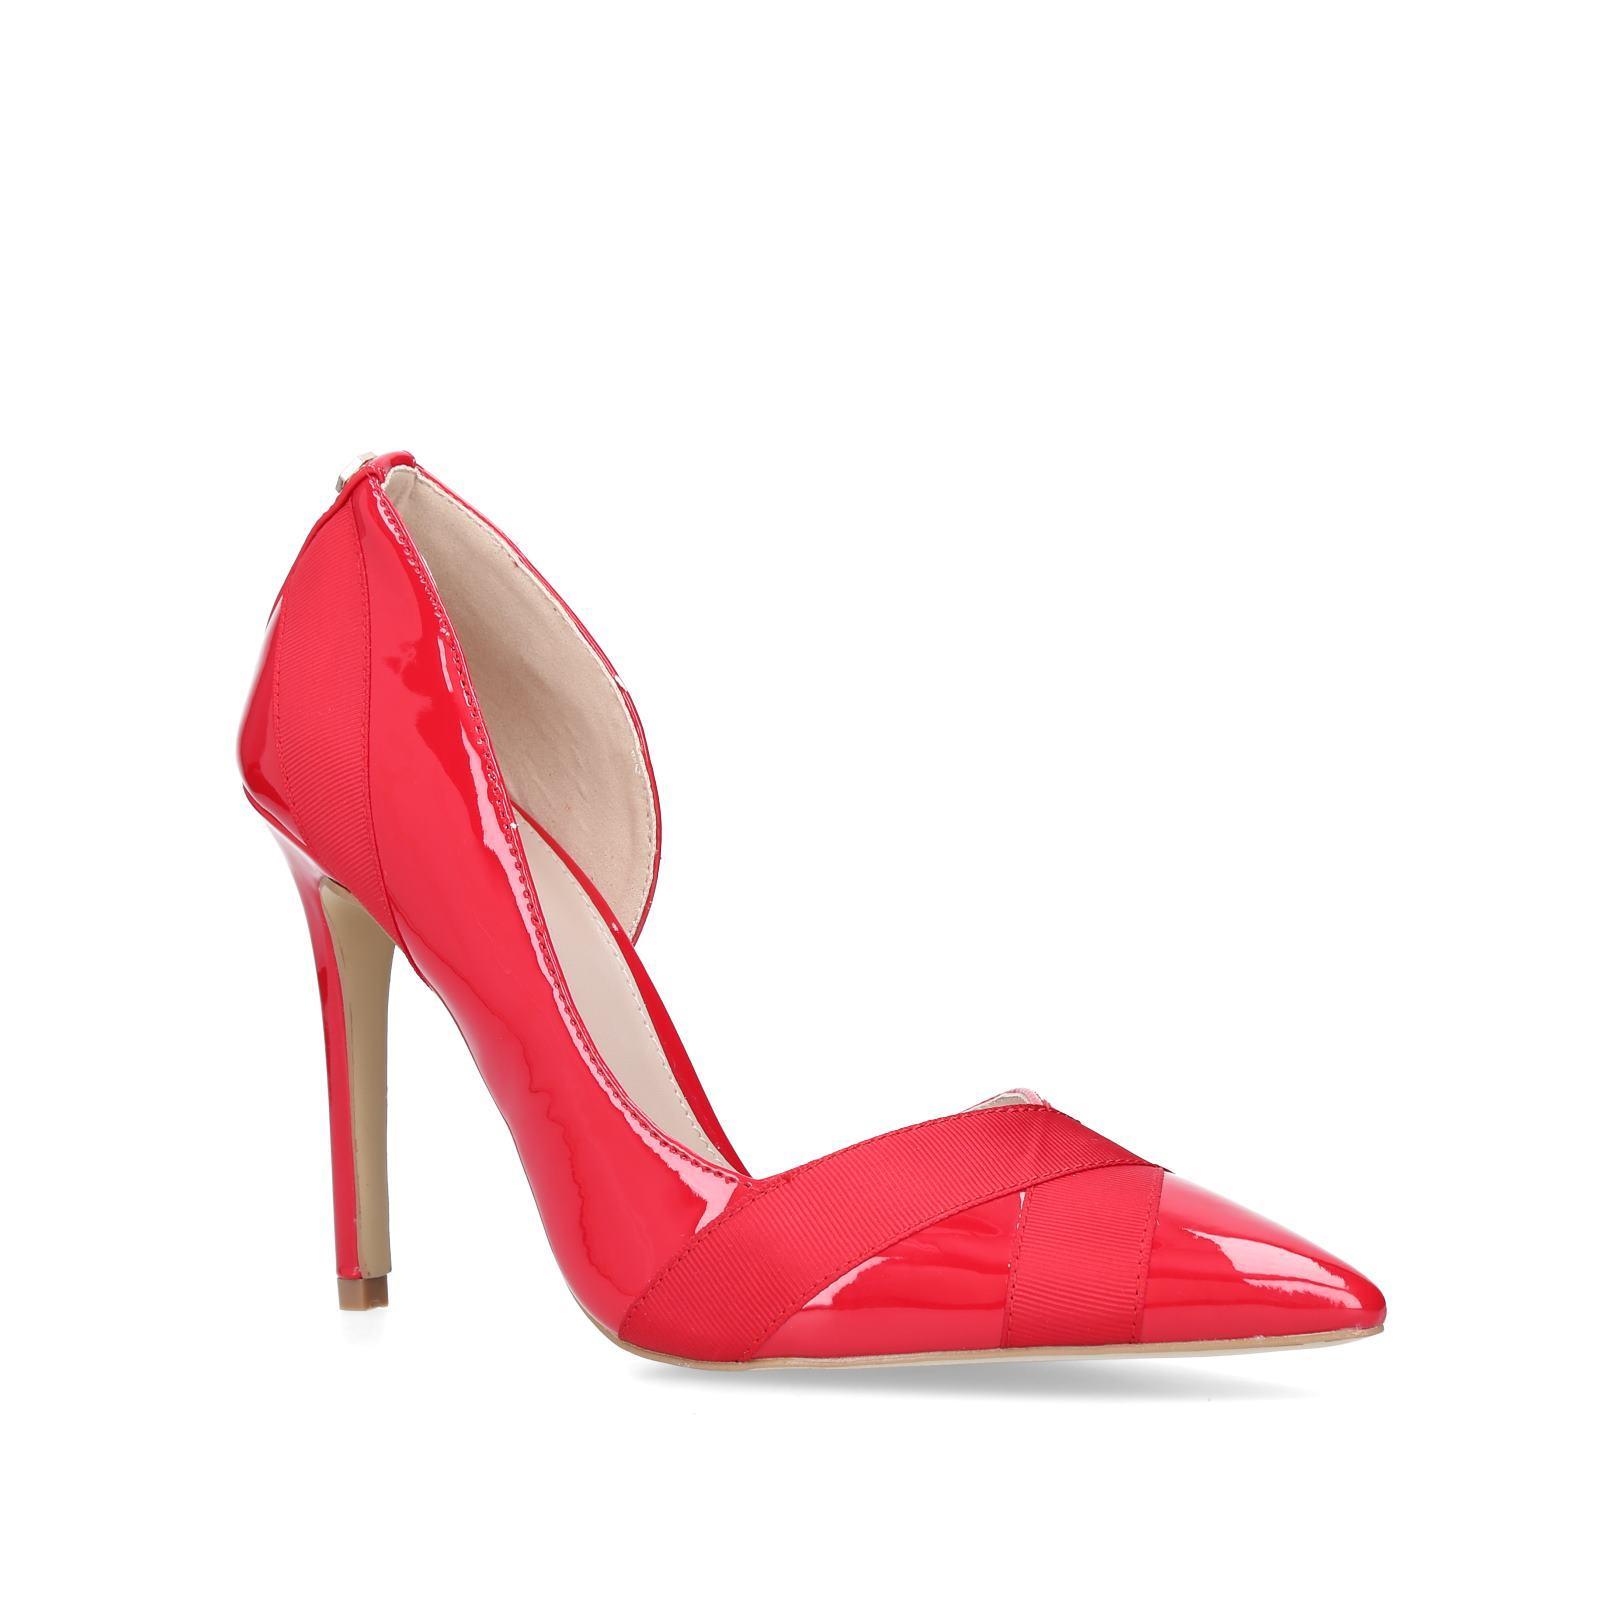 79f7f89929a Lark Stiletto Heeled Shoes